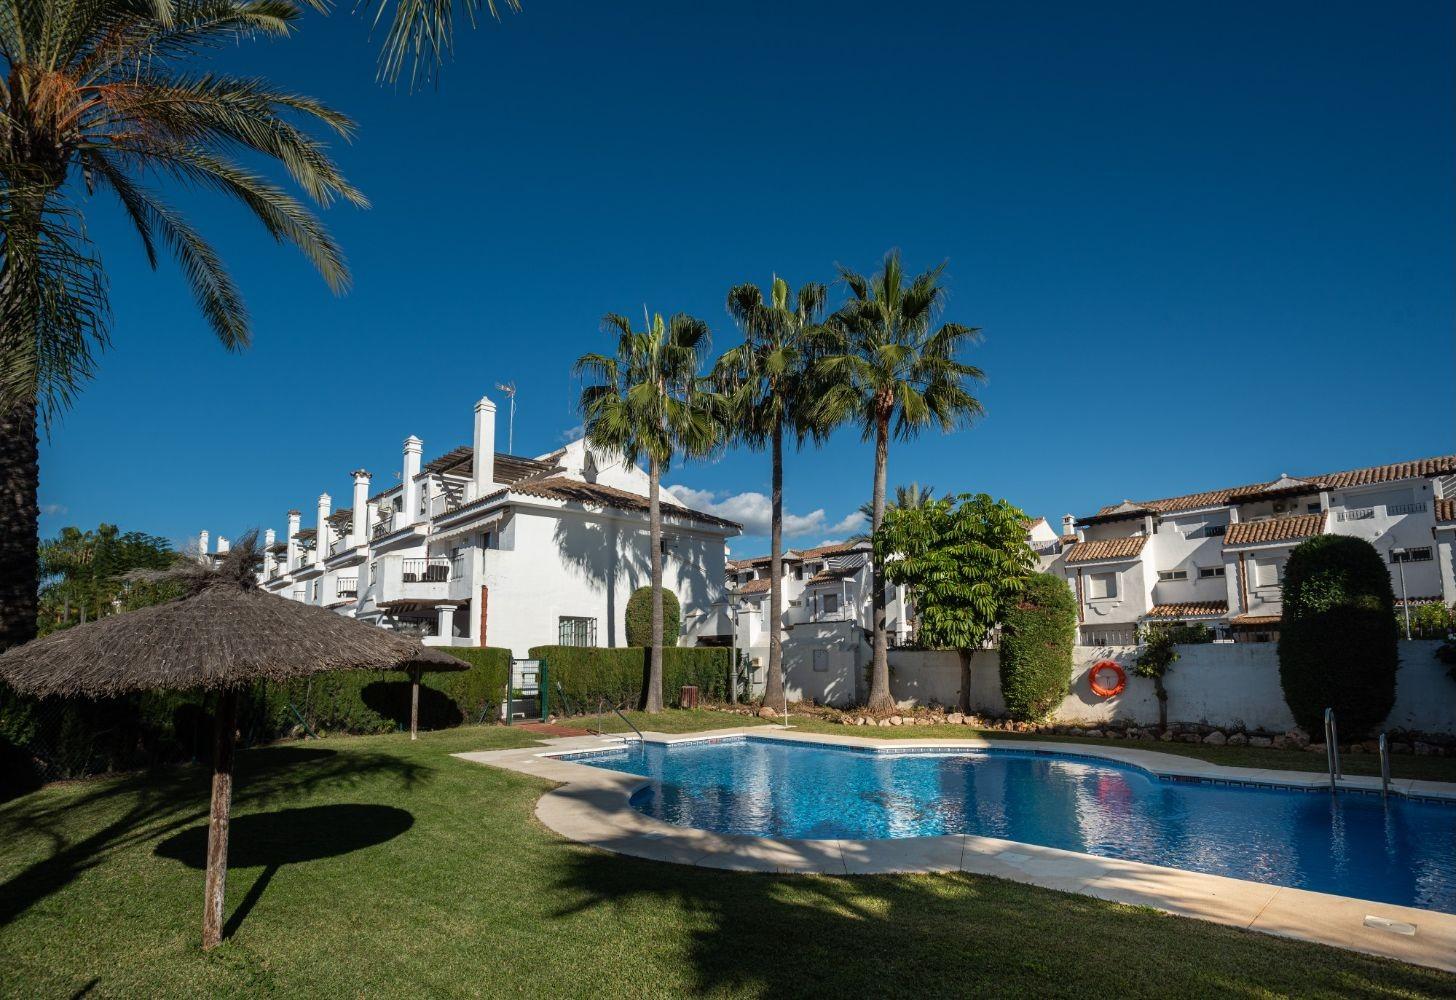 Townhouse in Marbella - Resale in Lexington Realty